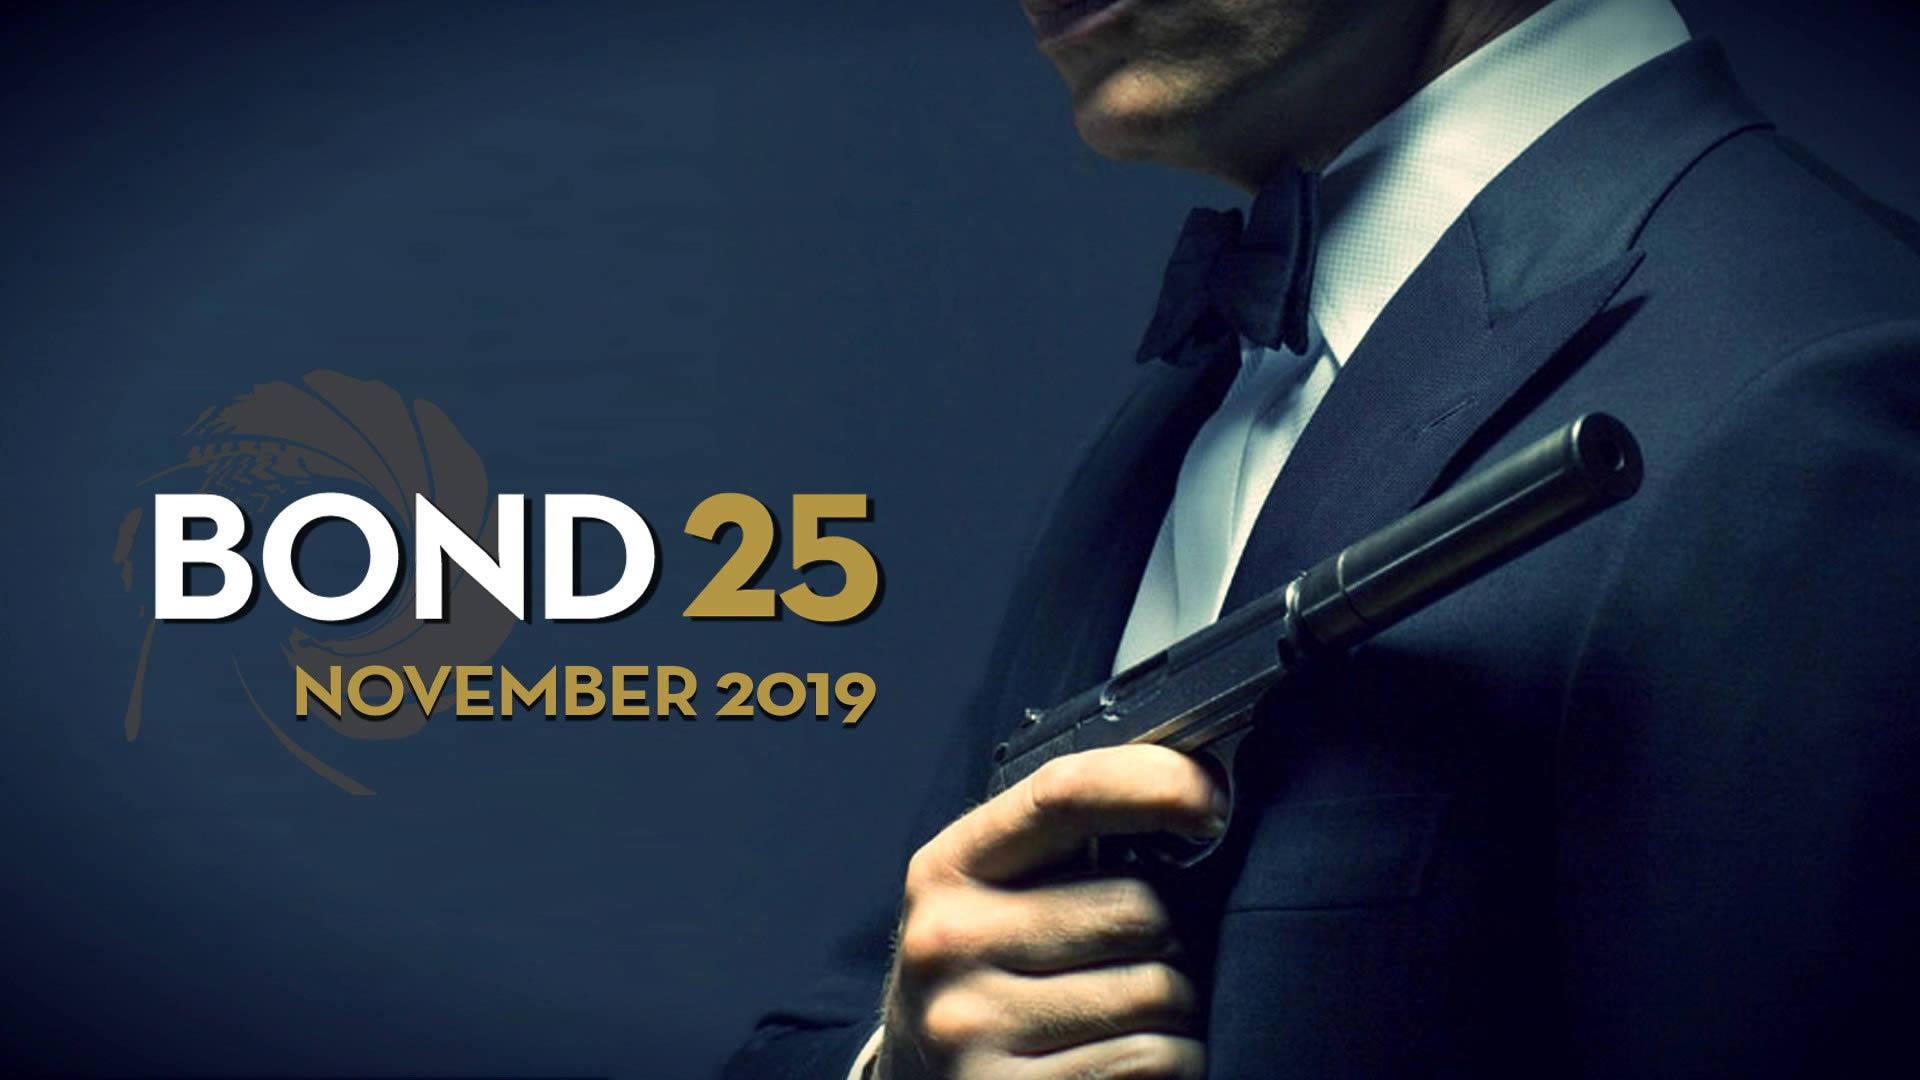 Bond 25 - the 2019 film 34